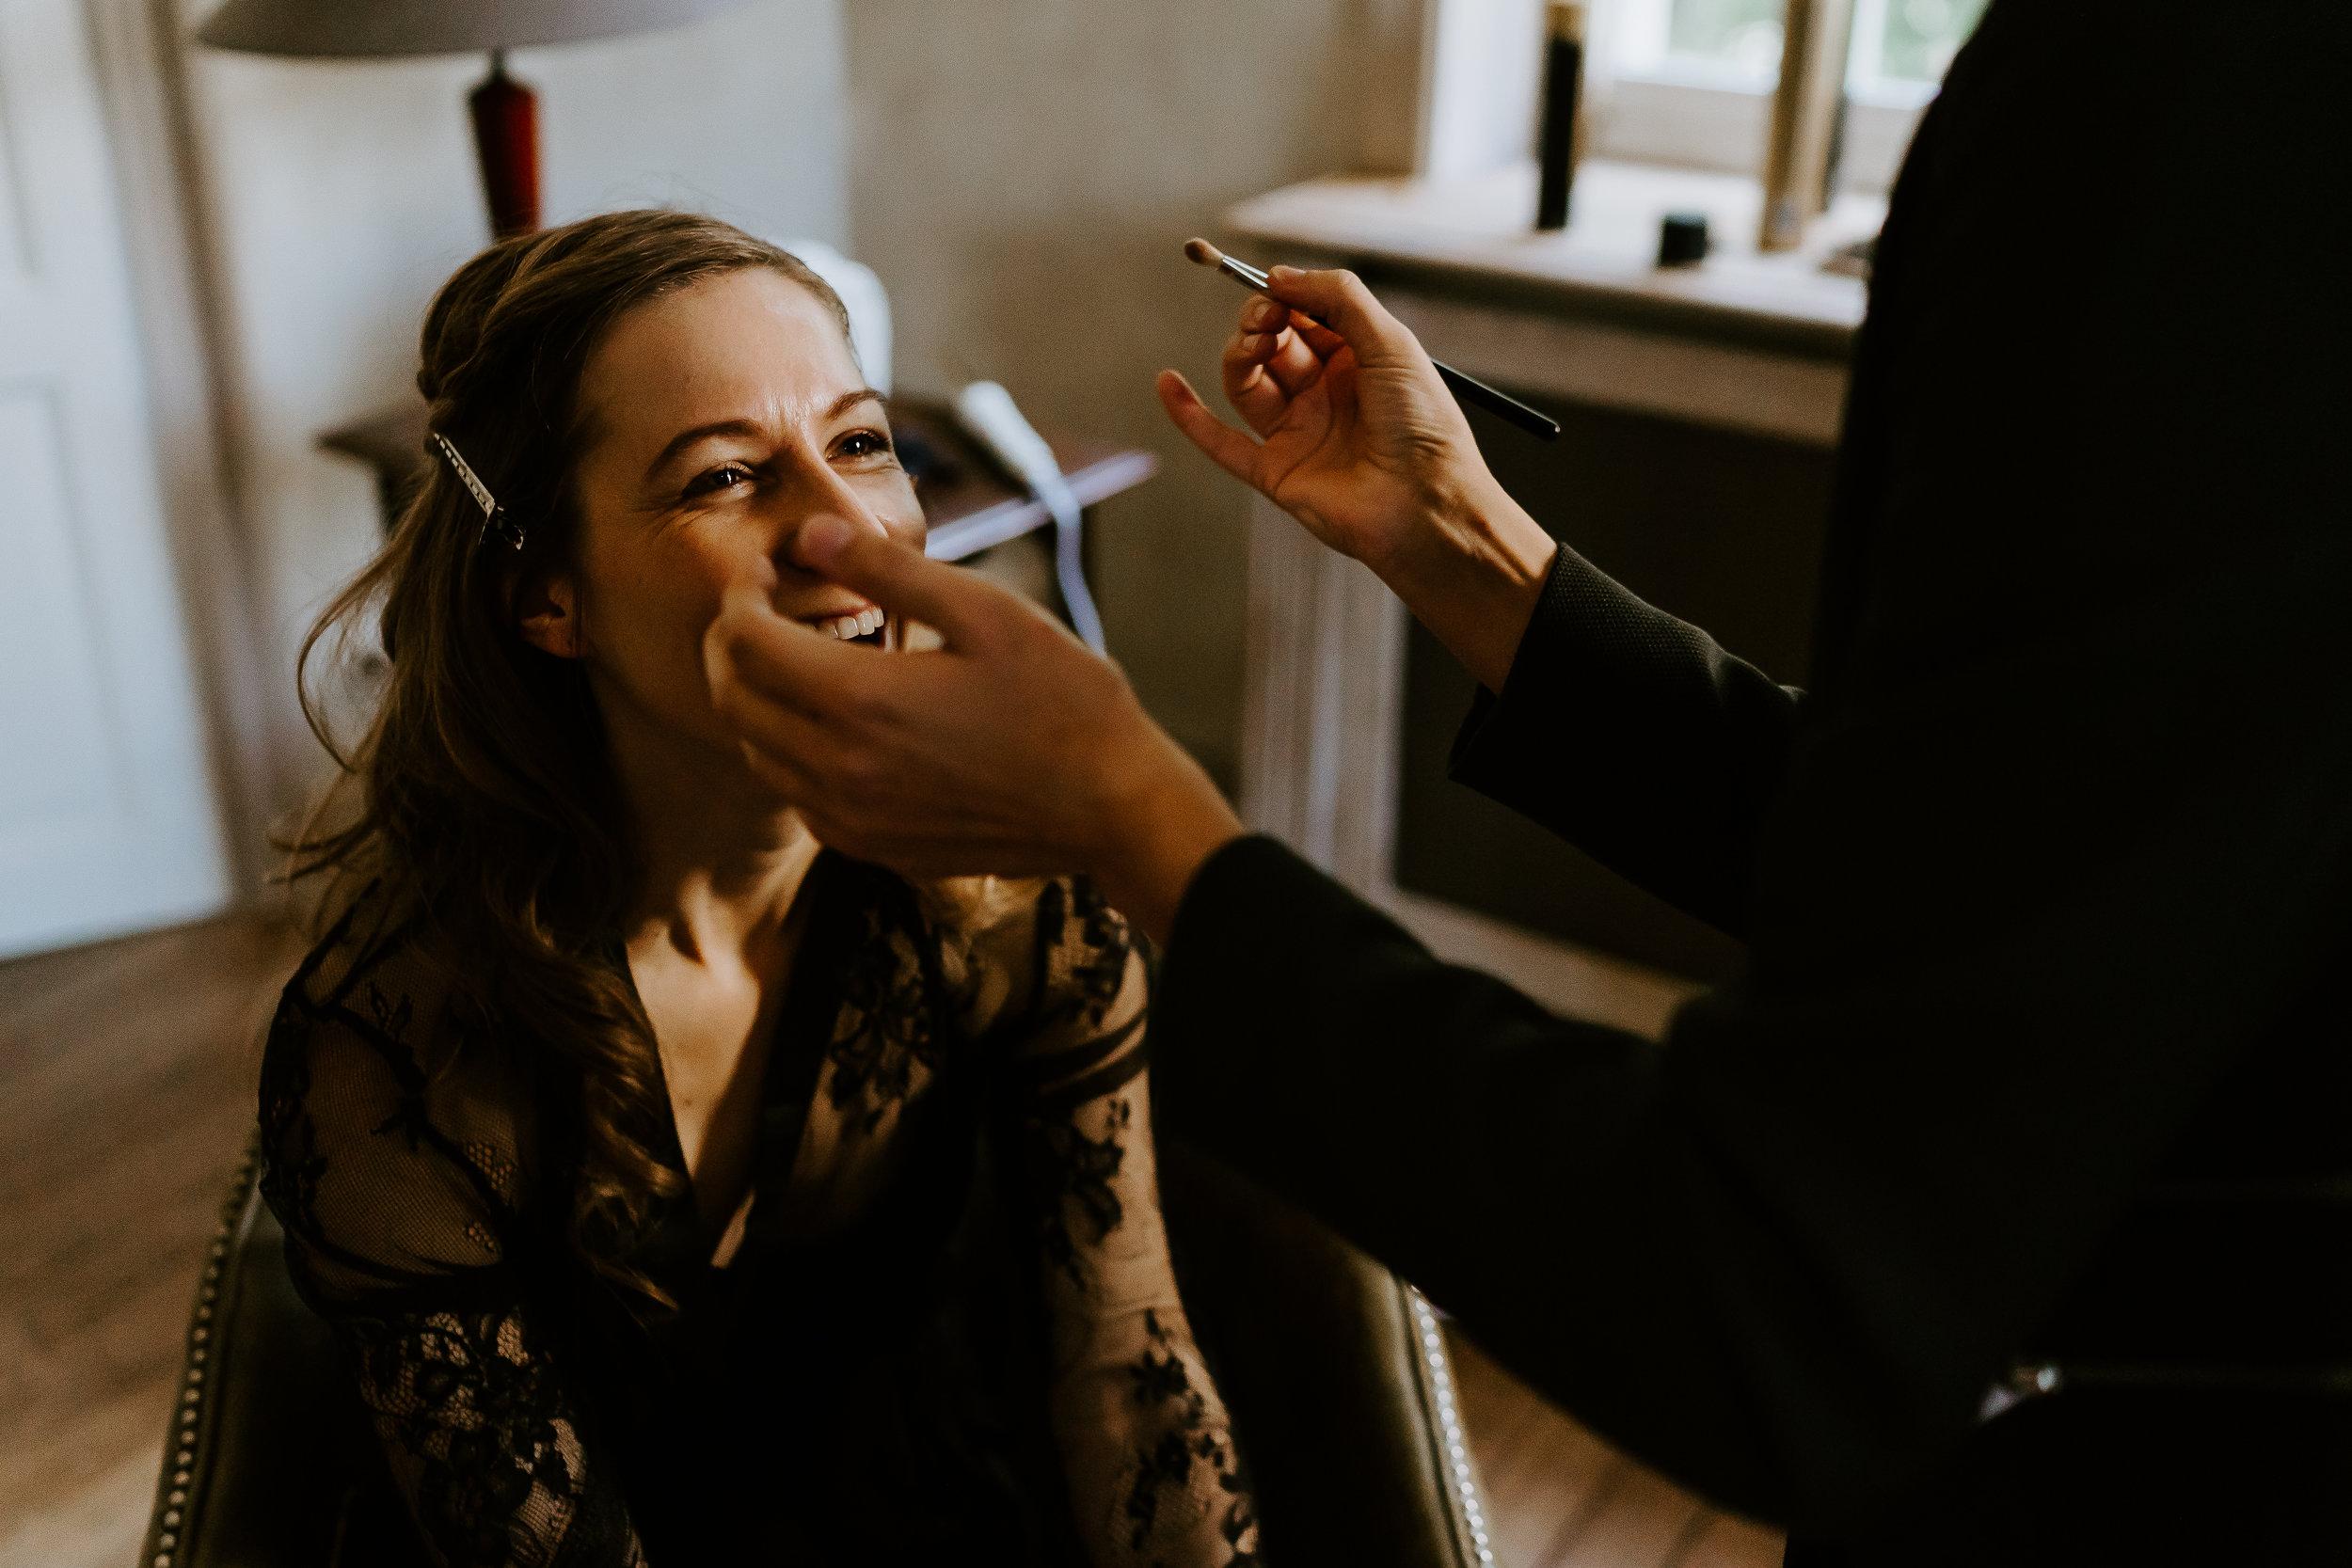 bruiloft-altembrouck-overthemoonweddings11.jpg